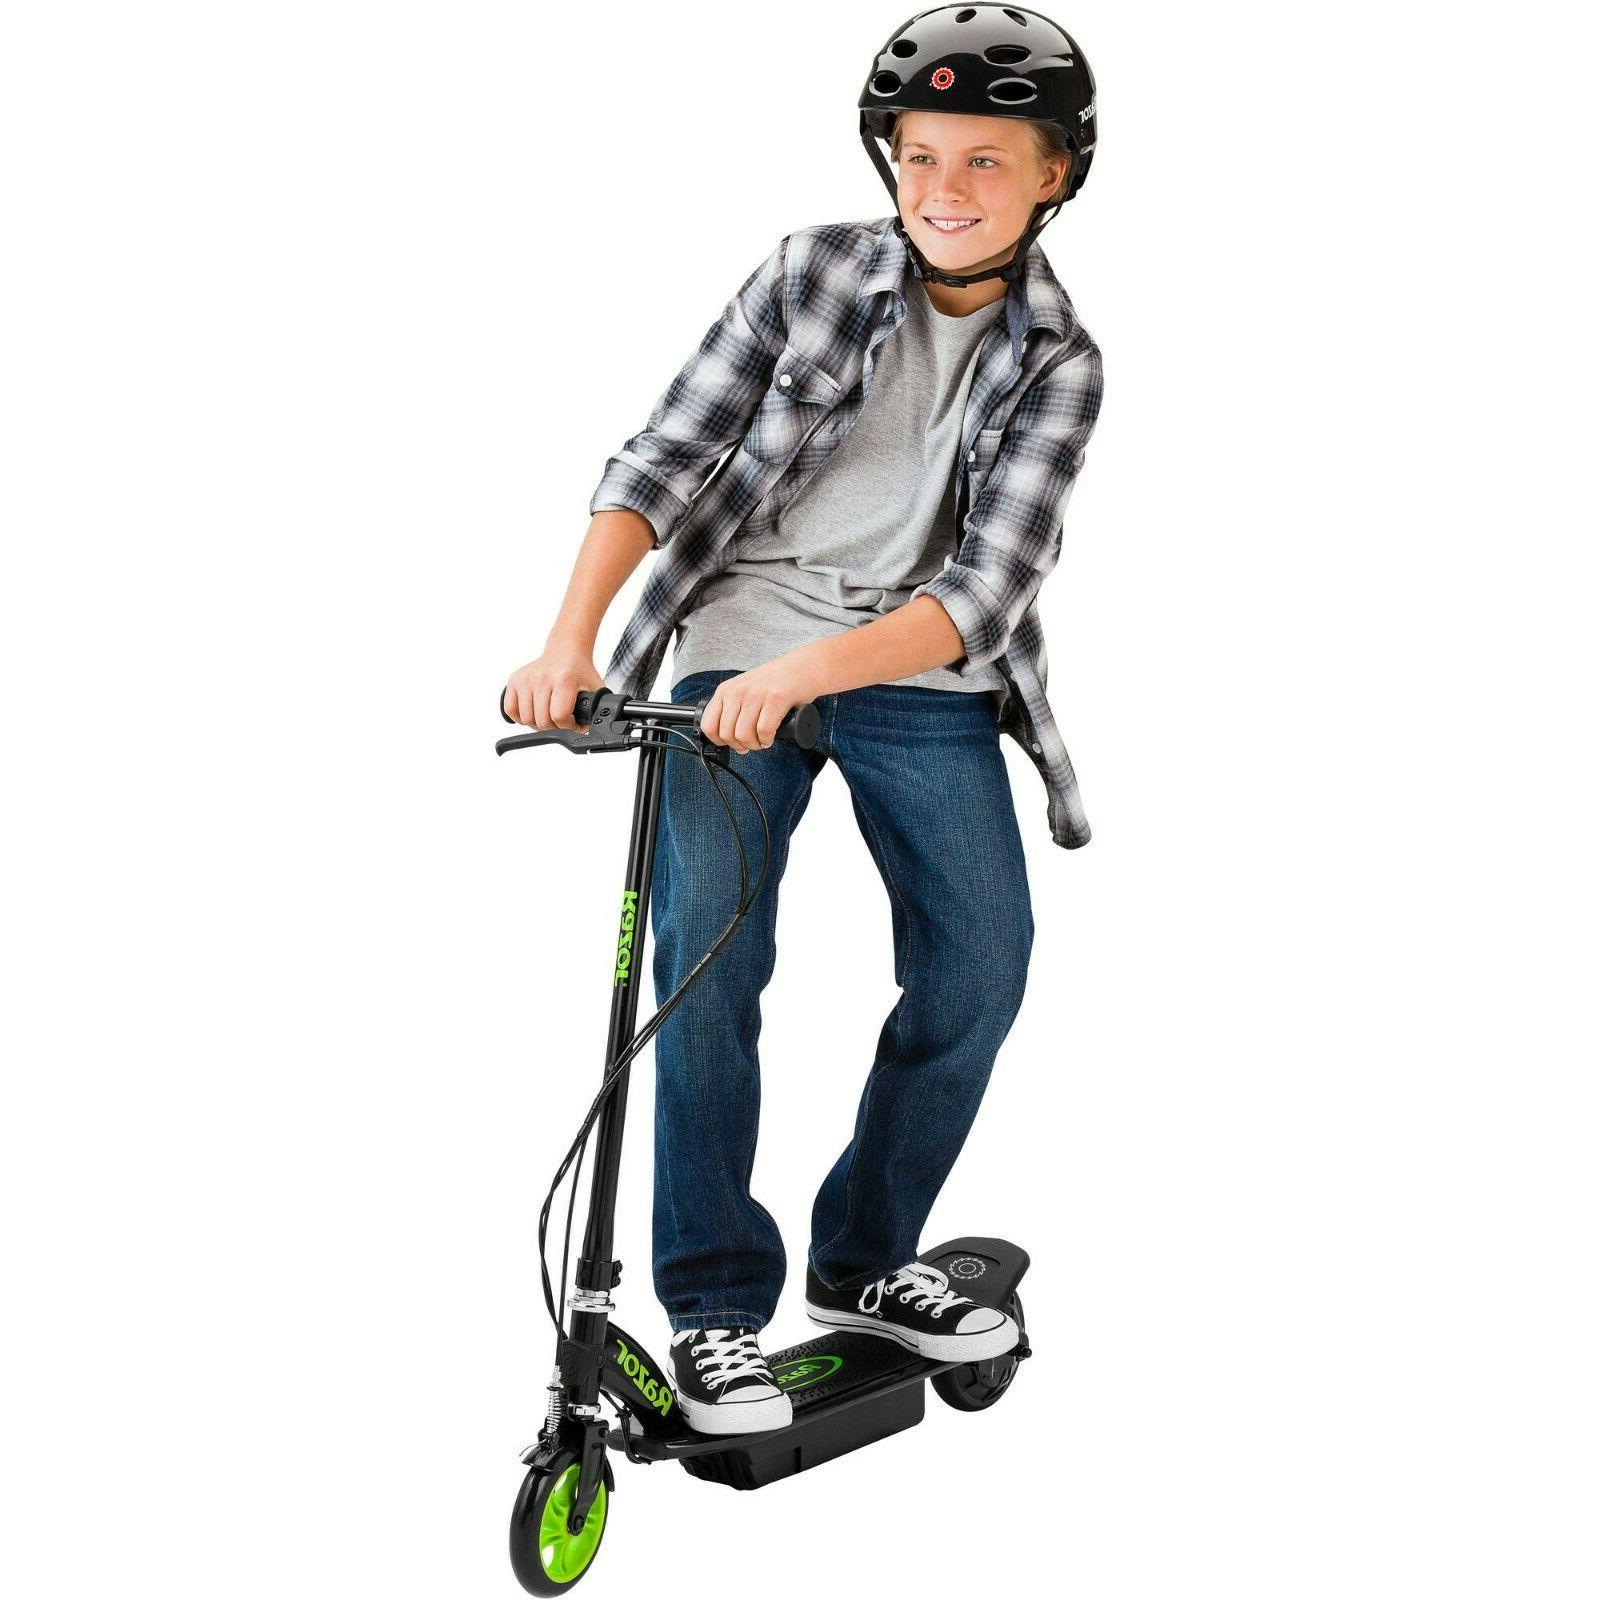 E95 Scooter for Motorized Ele Mi